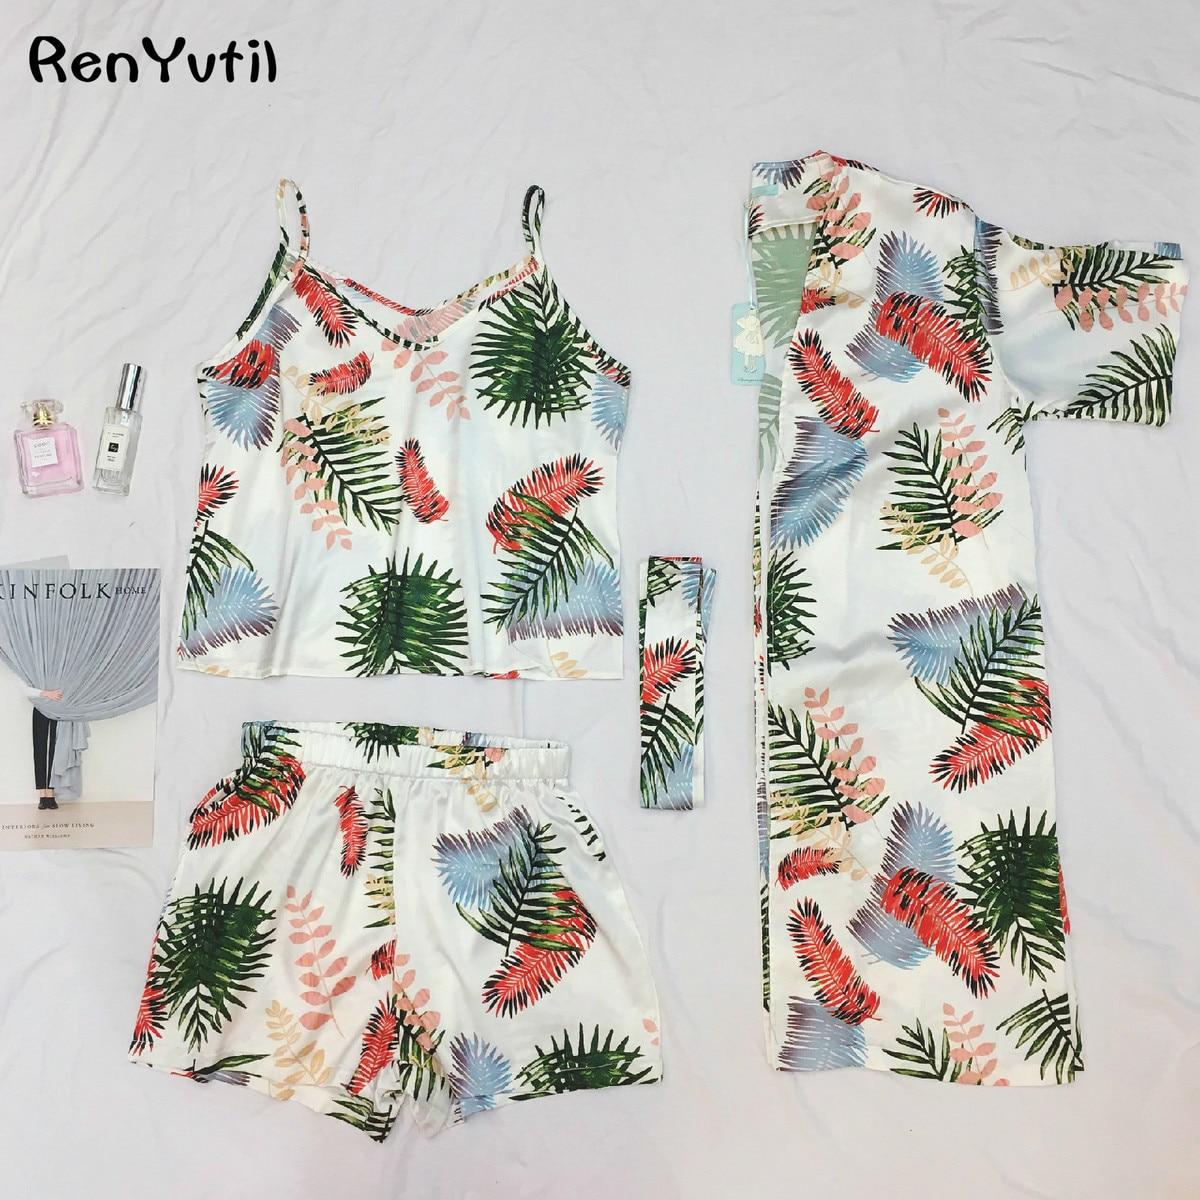 RenYvtil 2018 Fashion Summer Women Silk Bathrobe 3 PICS Pajamas Home Cloth Female Short-sleeve Nightdress Leisure Sleepwear